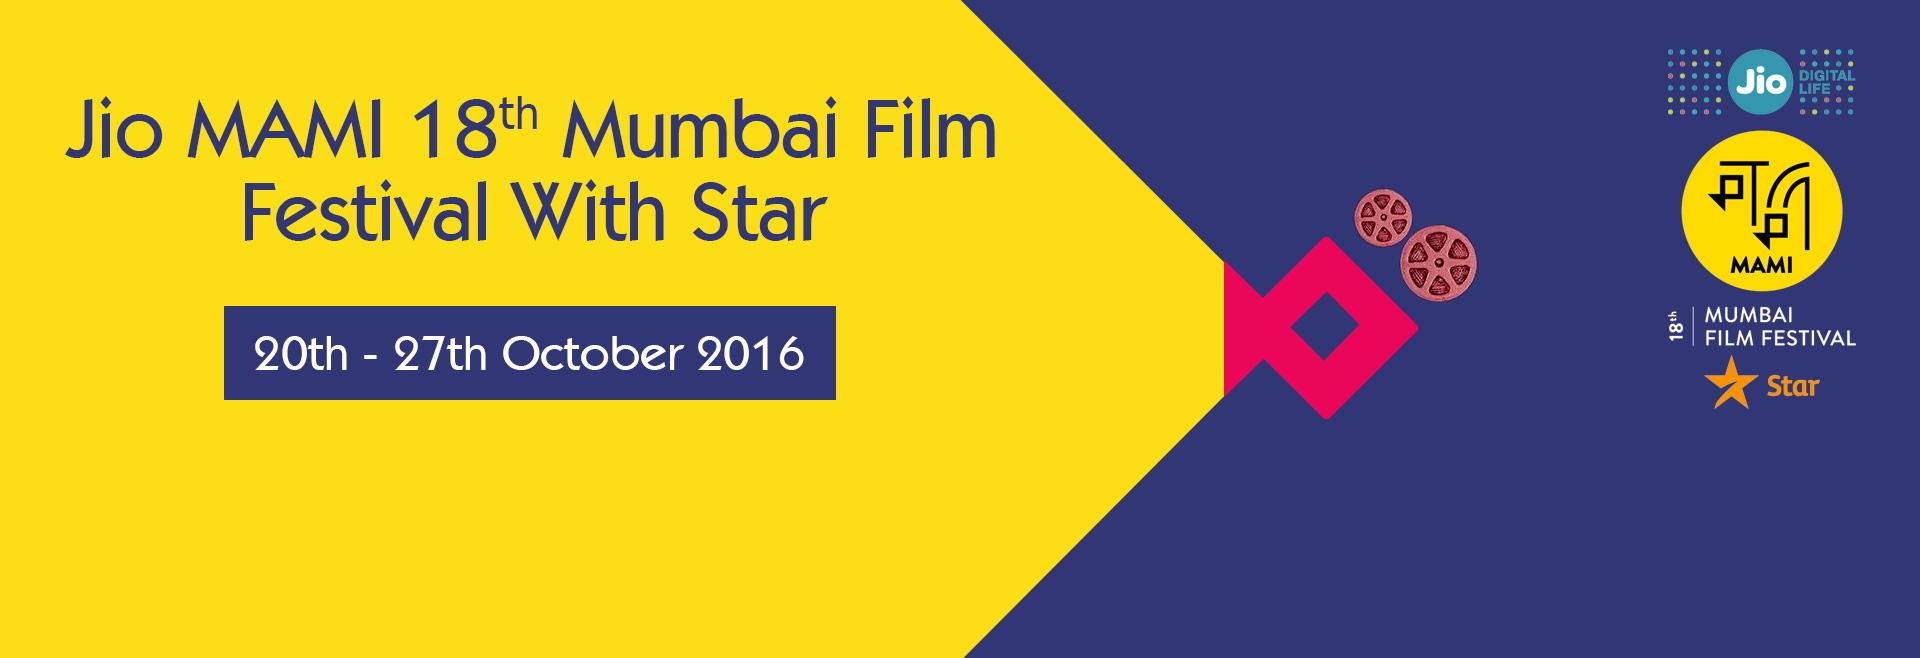 Jio MAMI 18th Mumbai Film Festival with Star